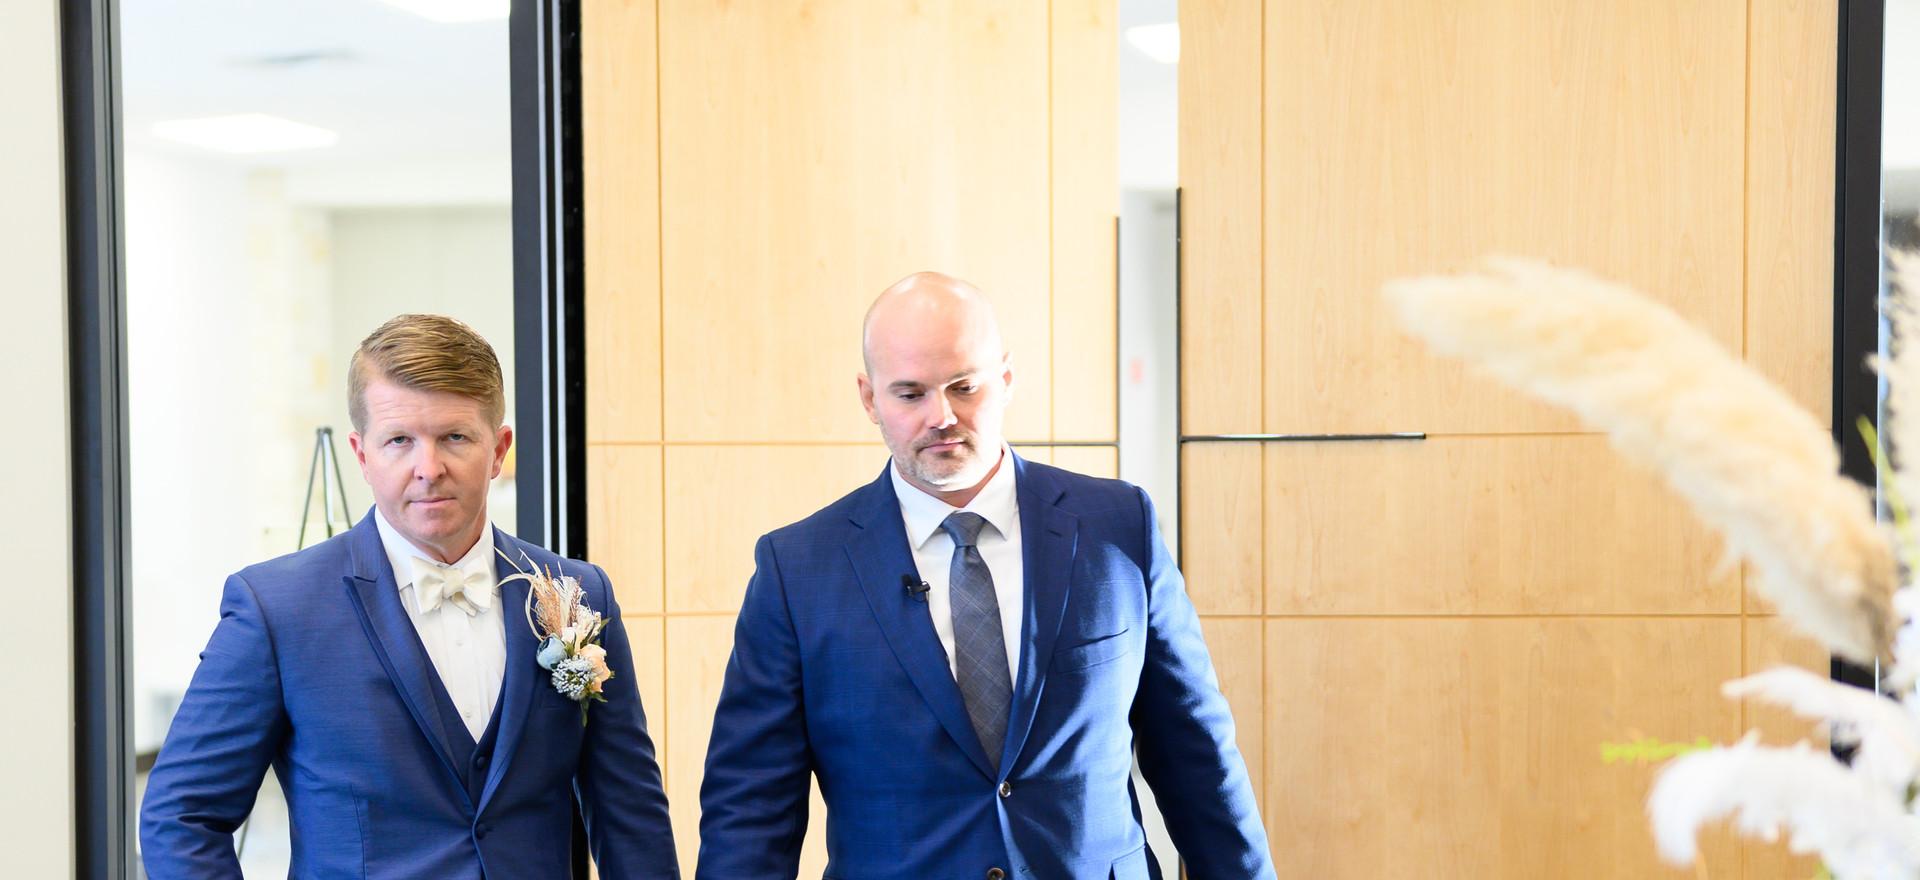 040_Lorena and Mike's Wedding day.jpg